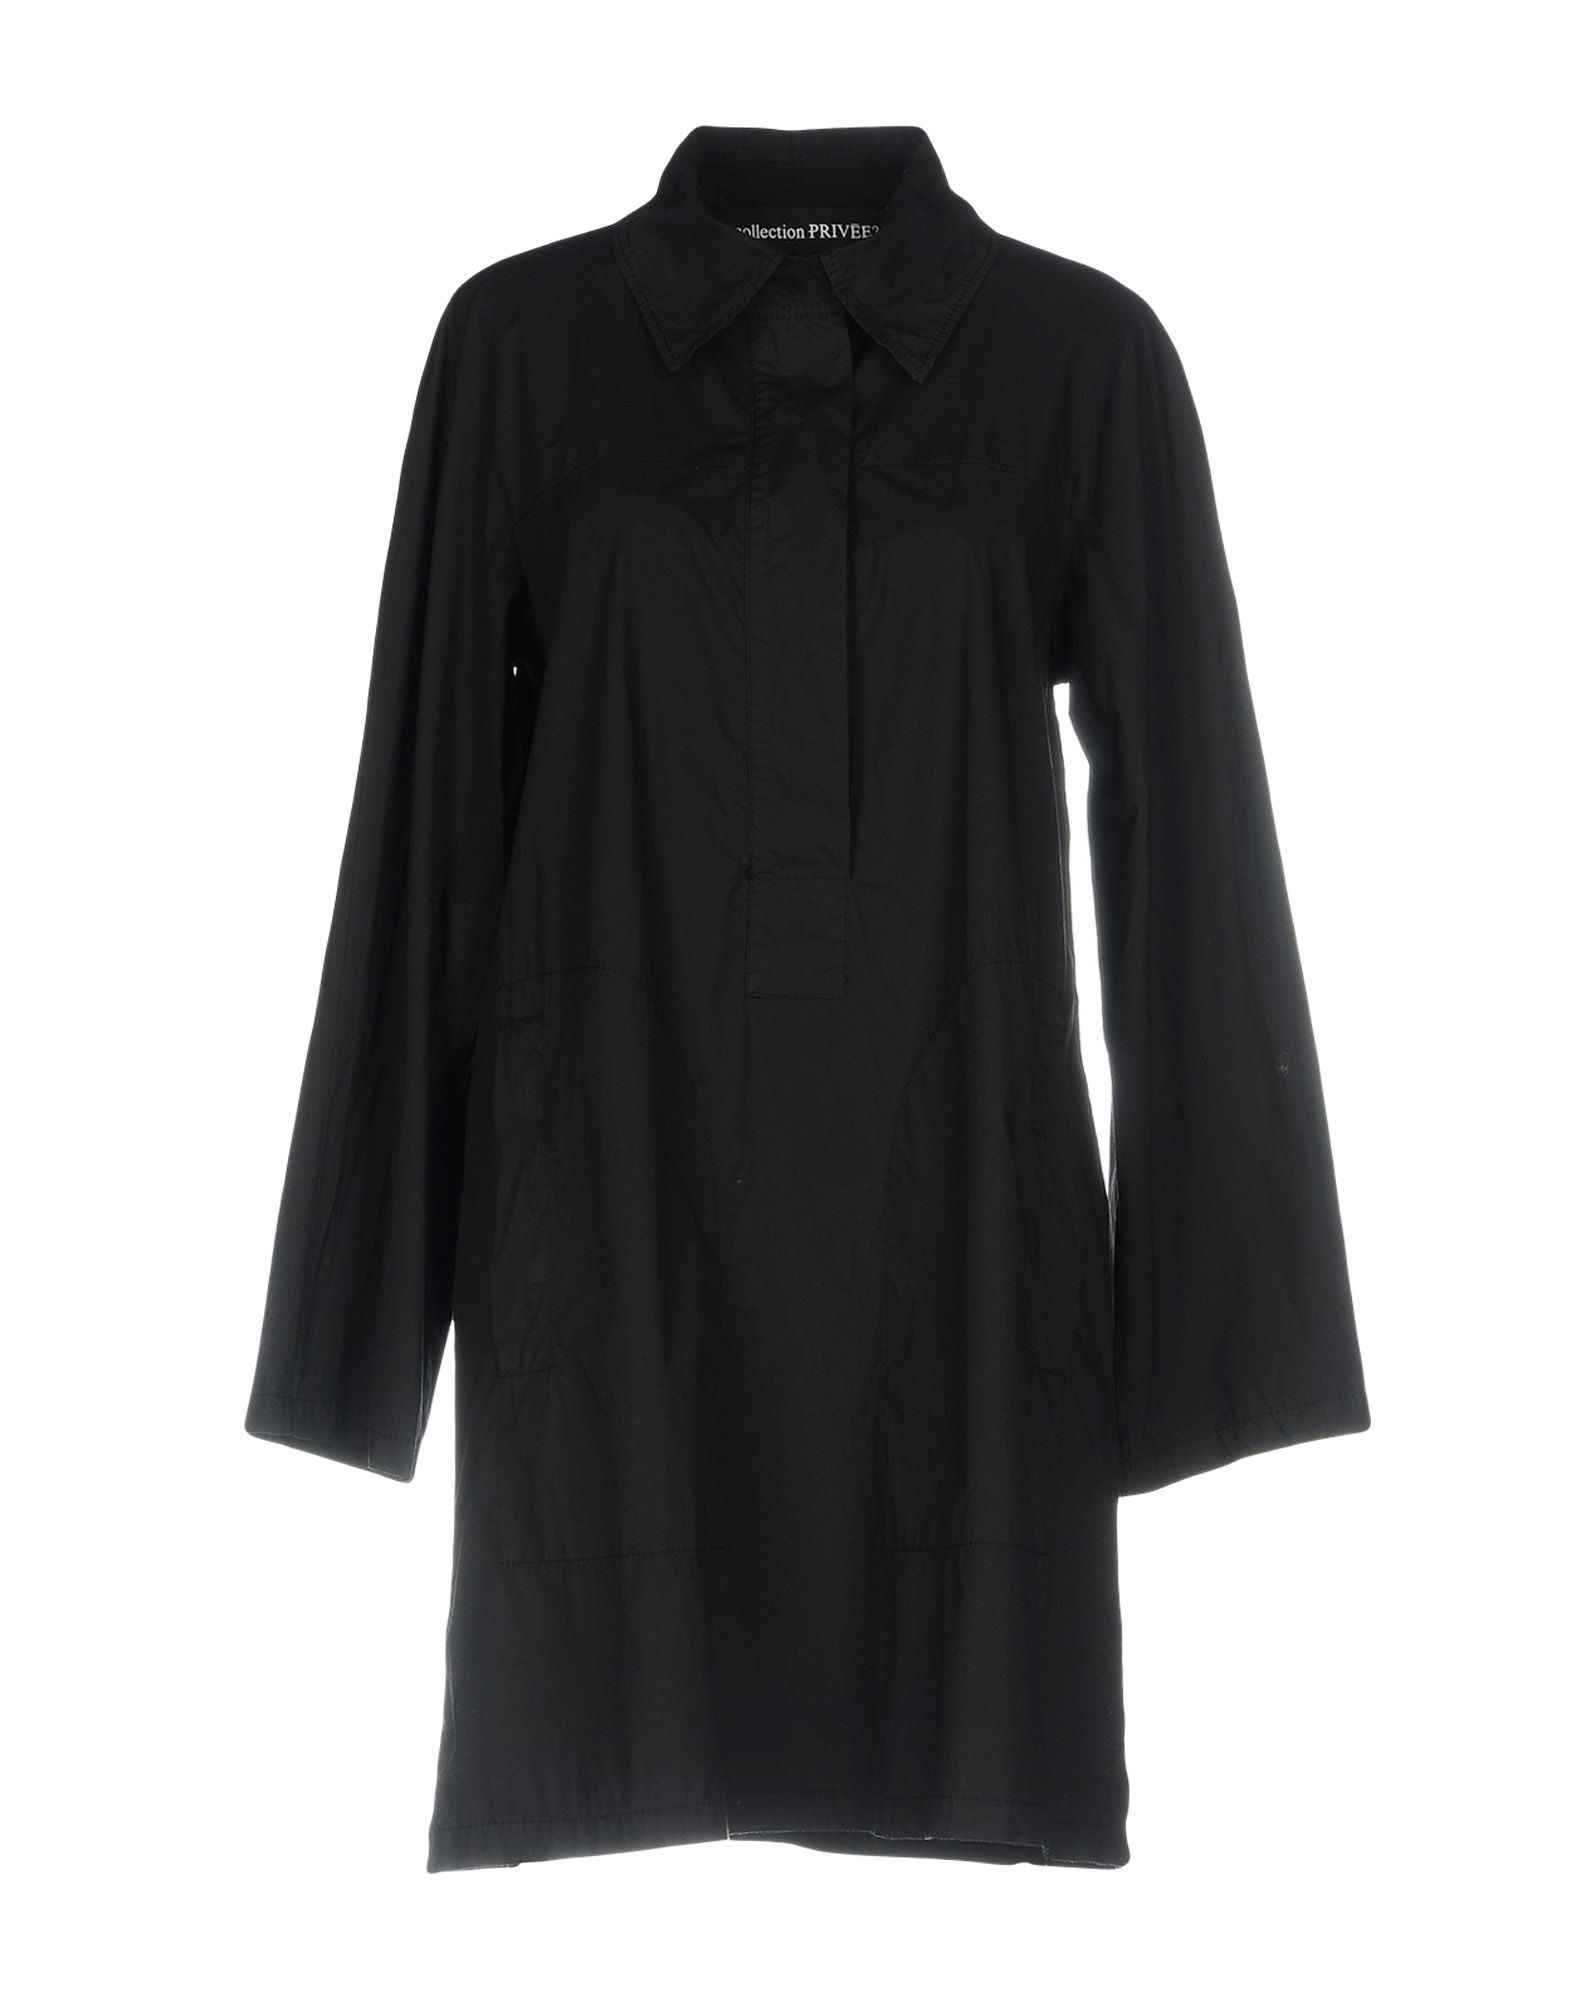 COLLECTION PRIVĒE? Короткое платье fine collection короткое платье